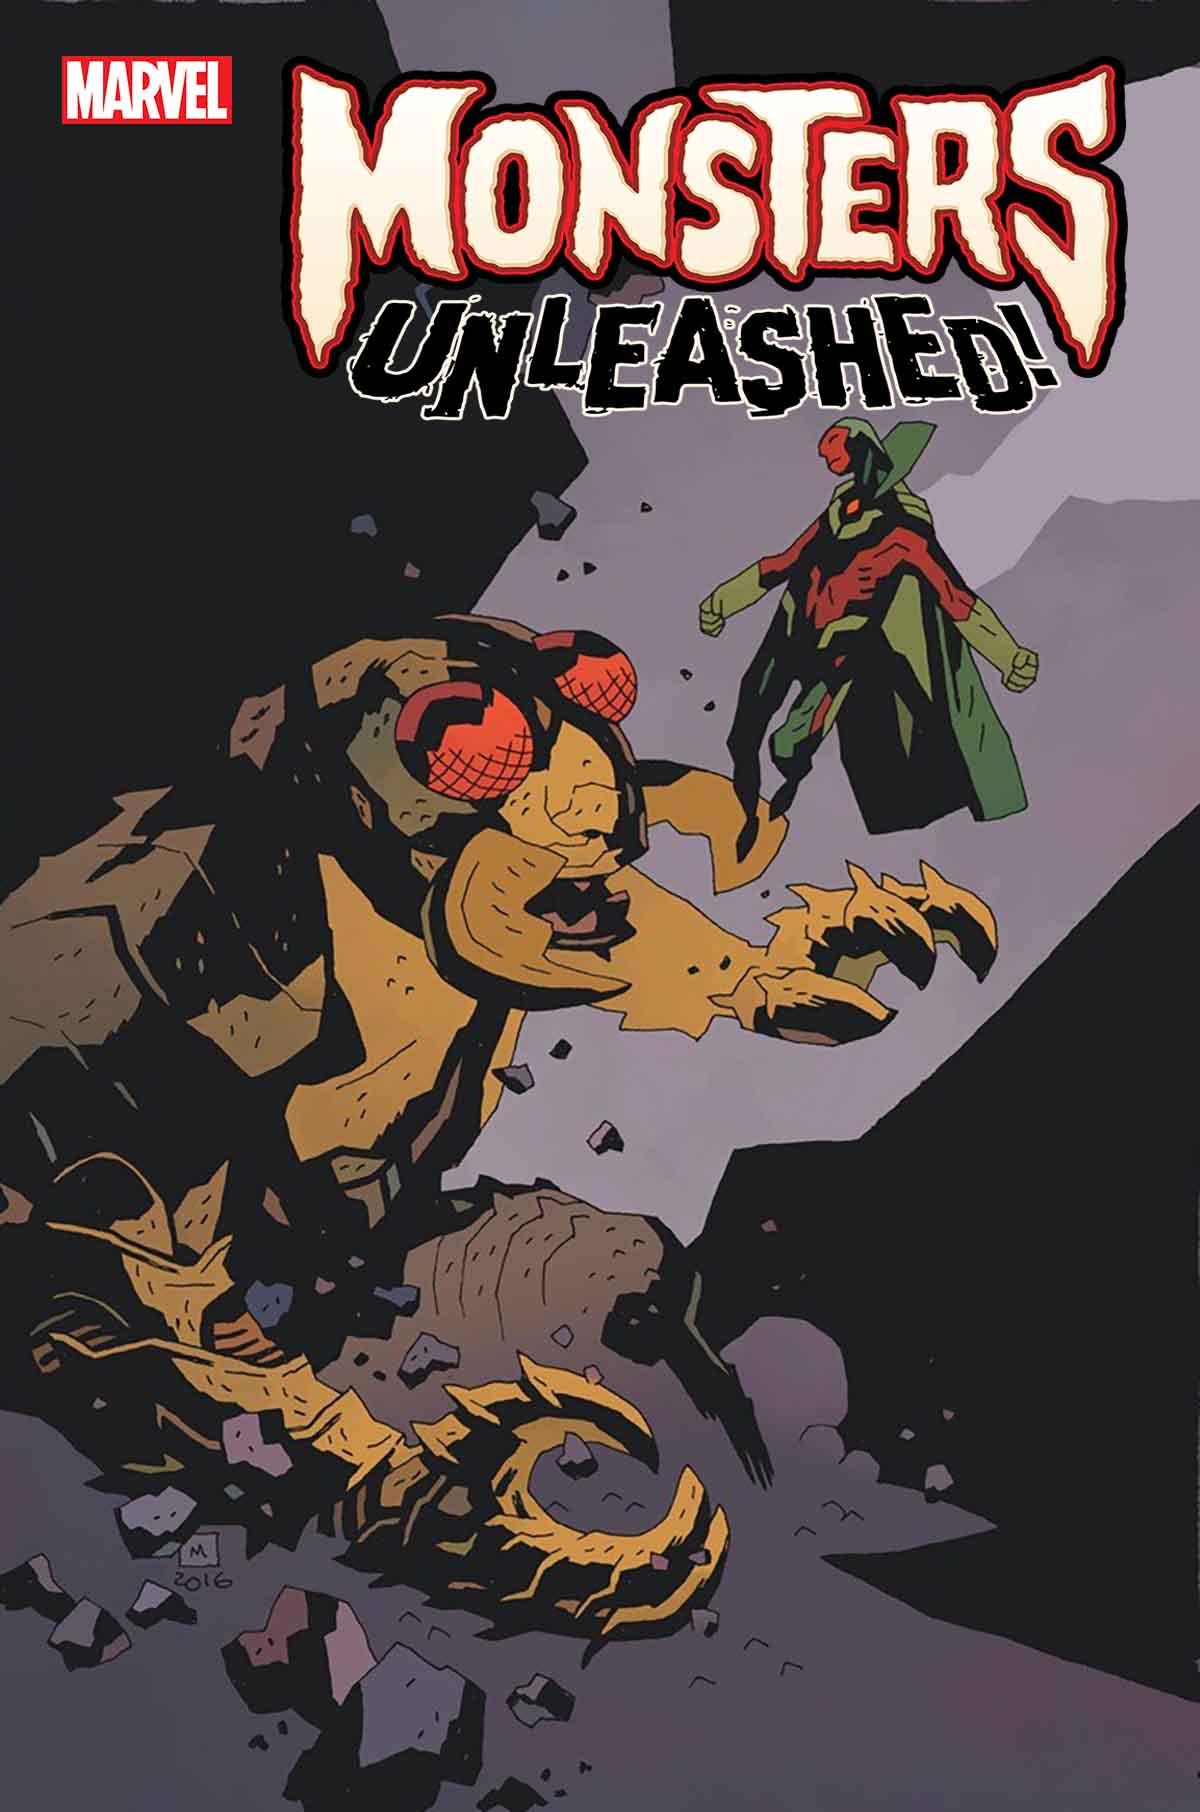 marvel-reveals-monsters-unleashed-variant-cover-art